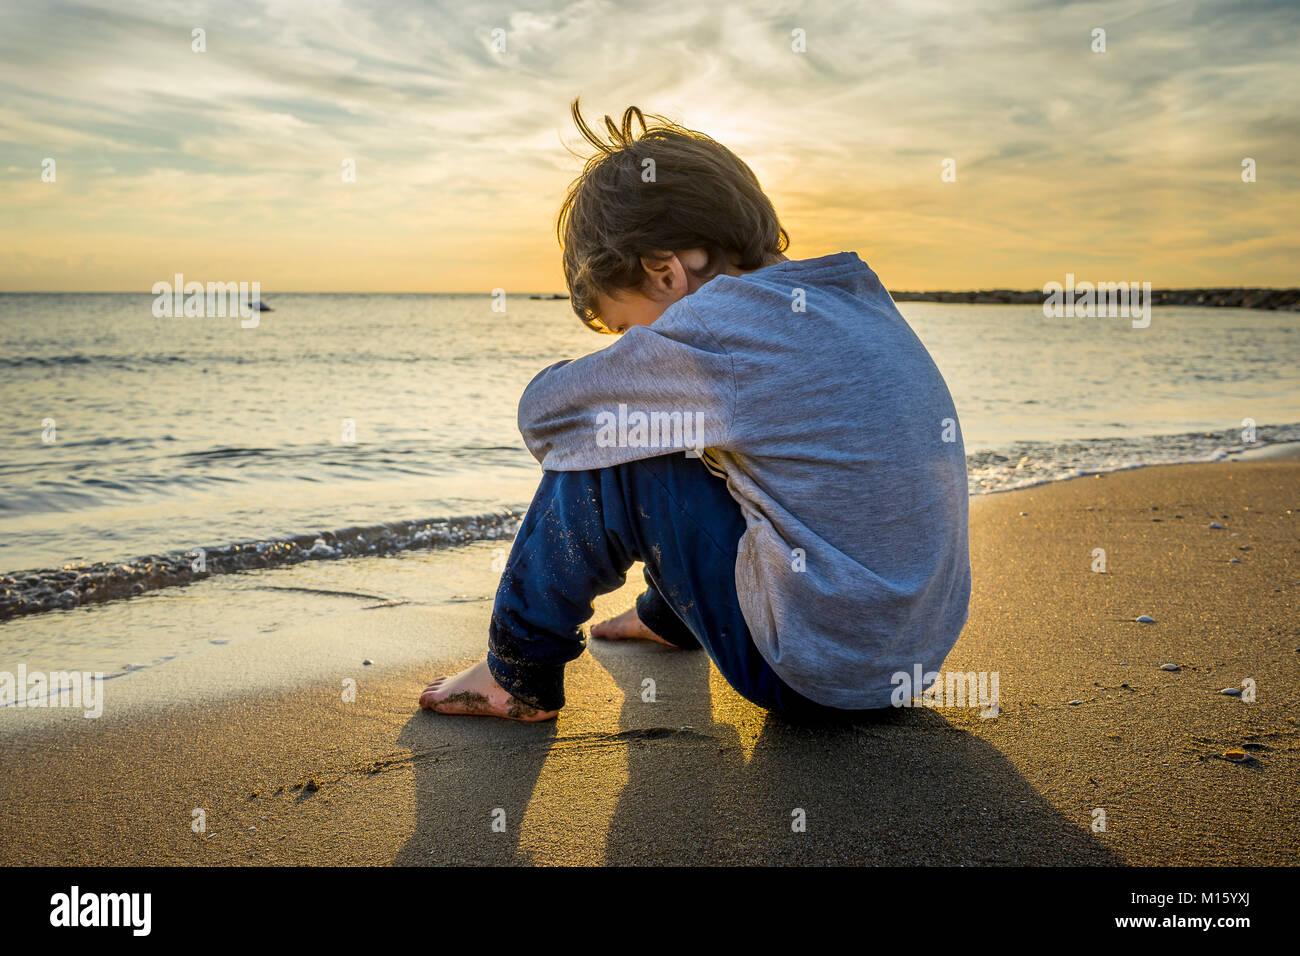 Sad boy sitting on the beach stock image